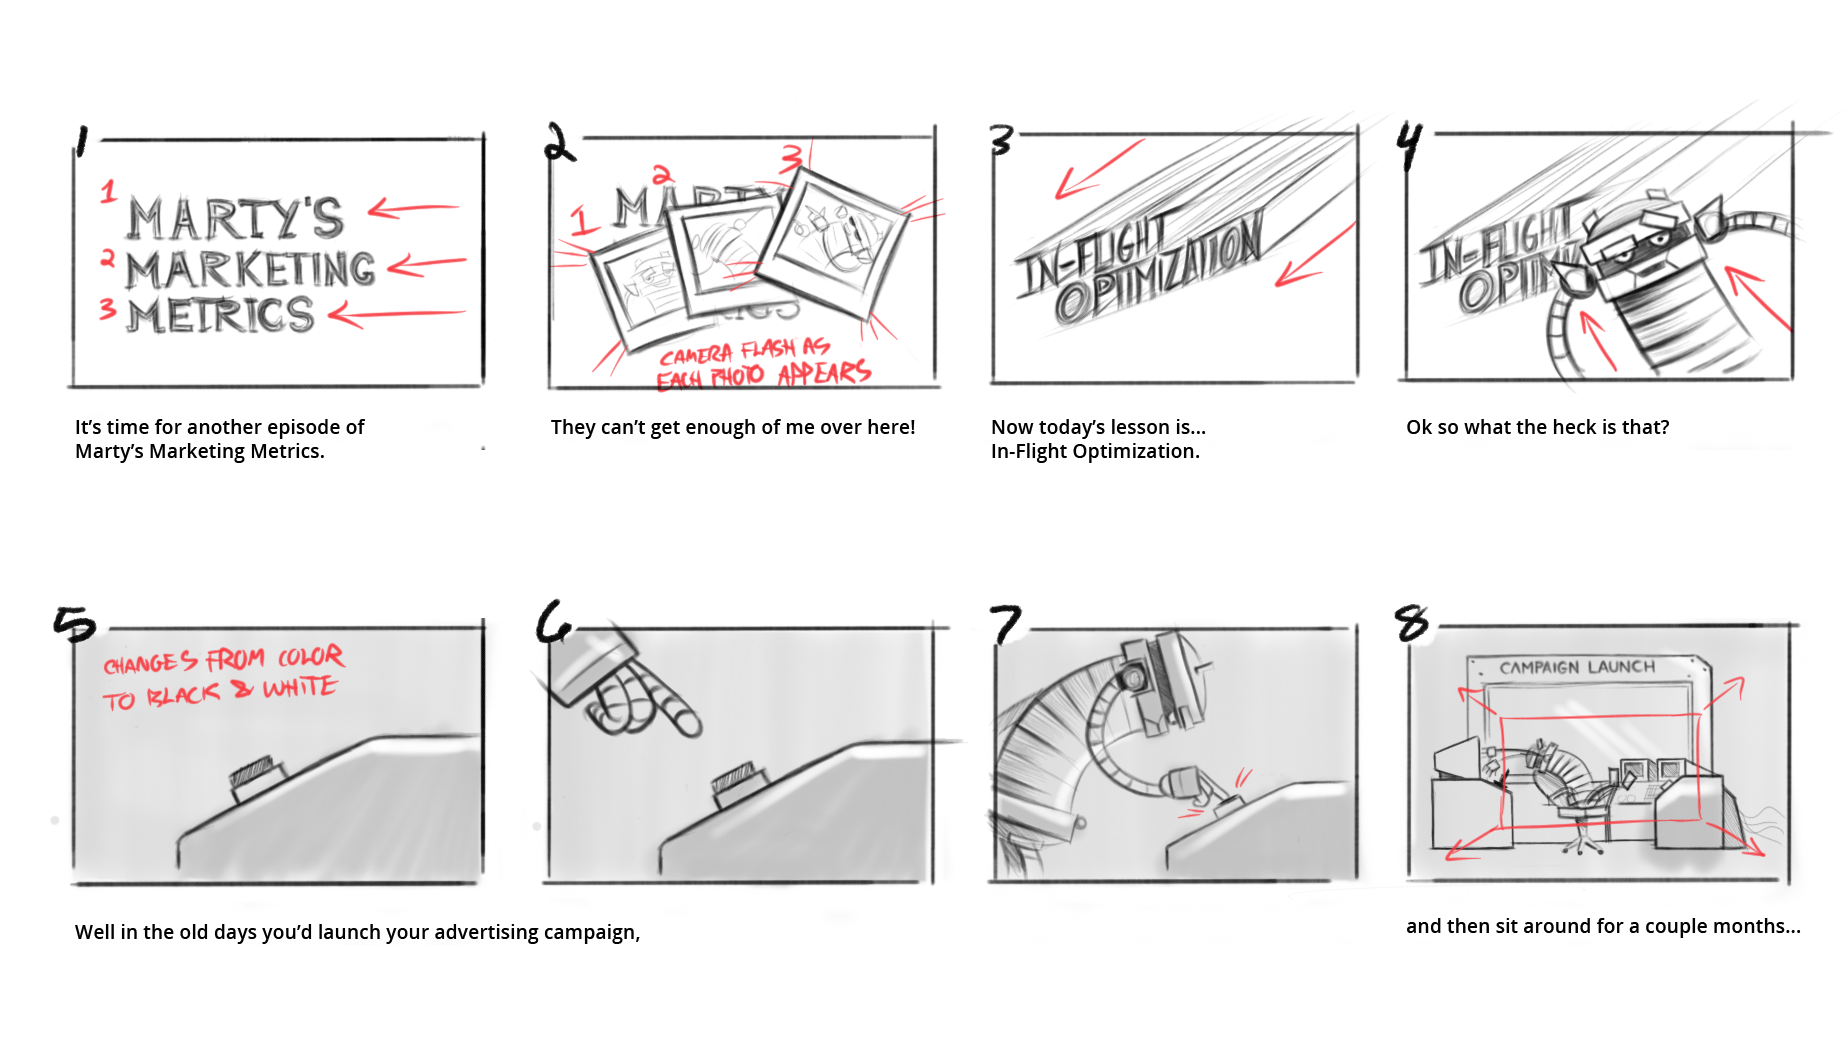 In-Flight-Optimization storyboard page 1